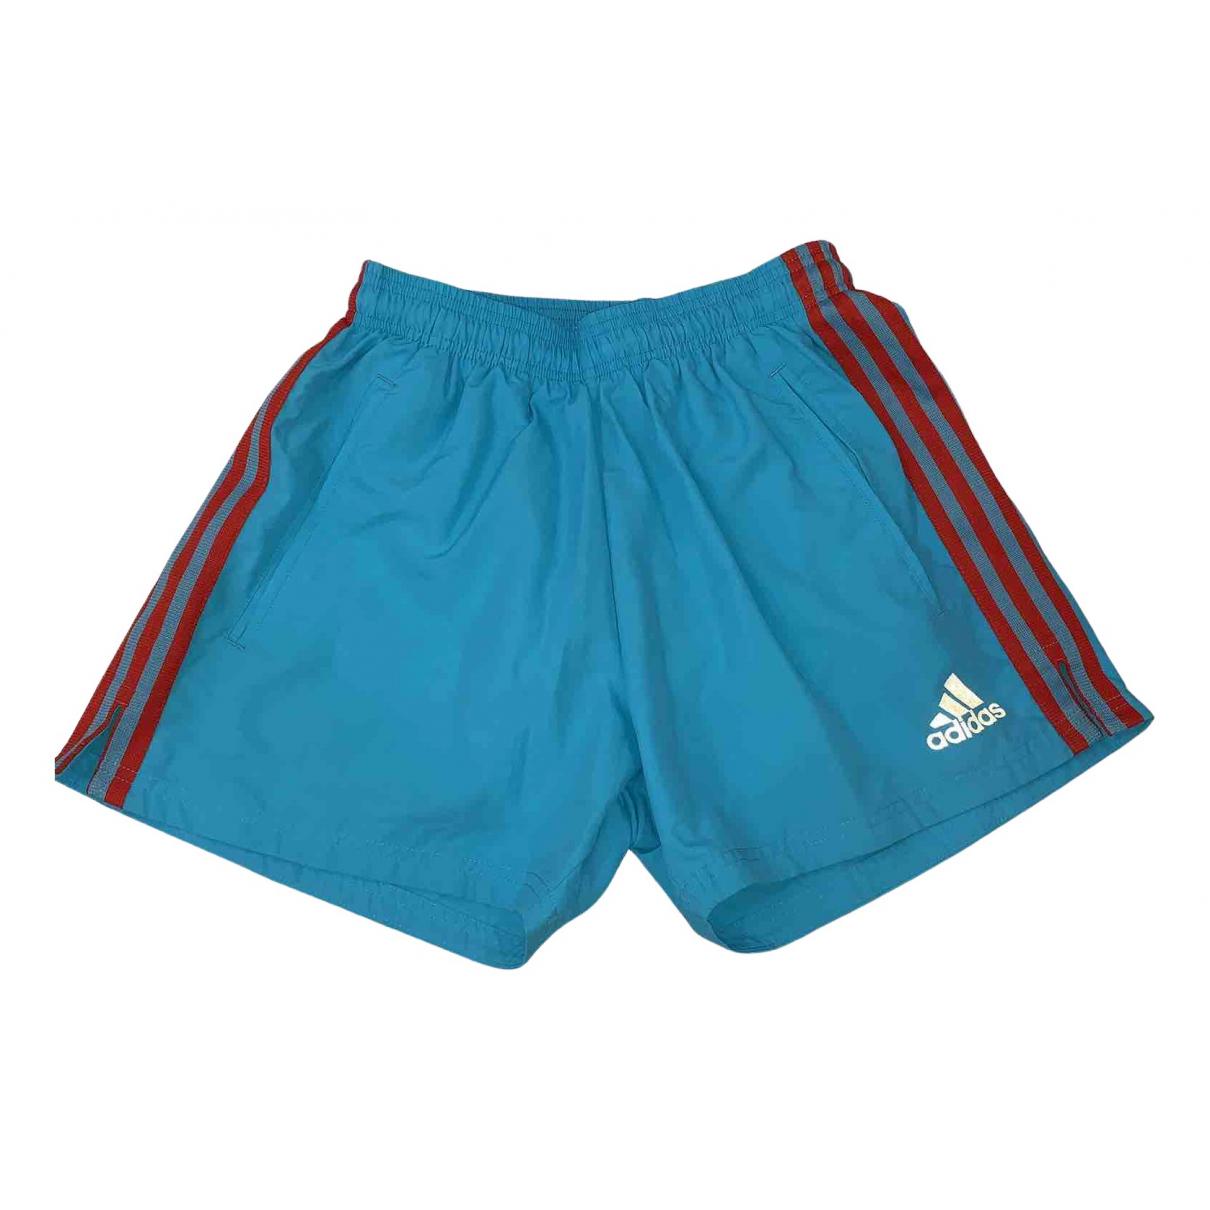 Adidas X Gosha Rubchinskiy N Blue Shorts for Men S International